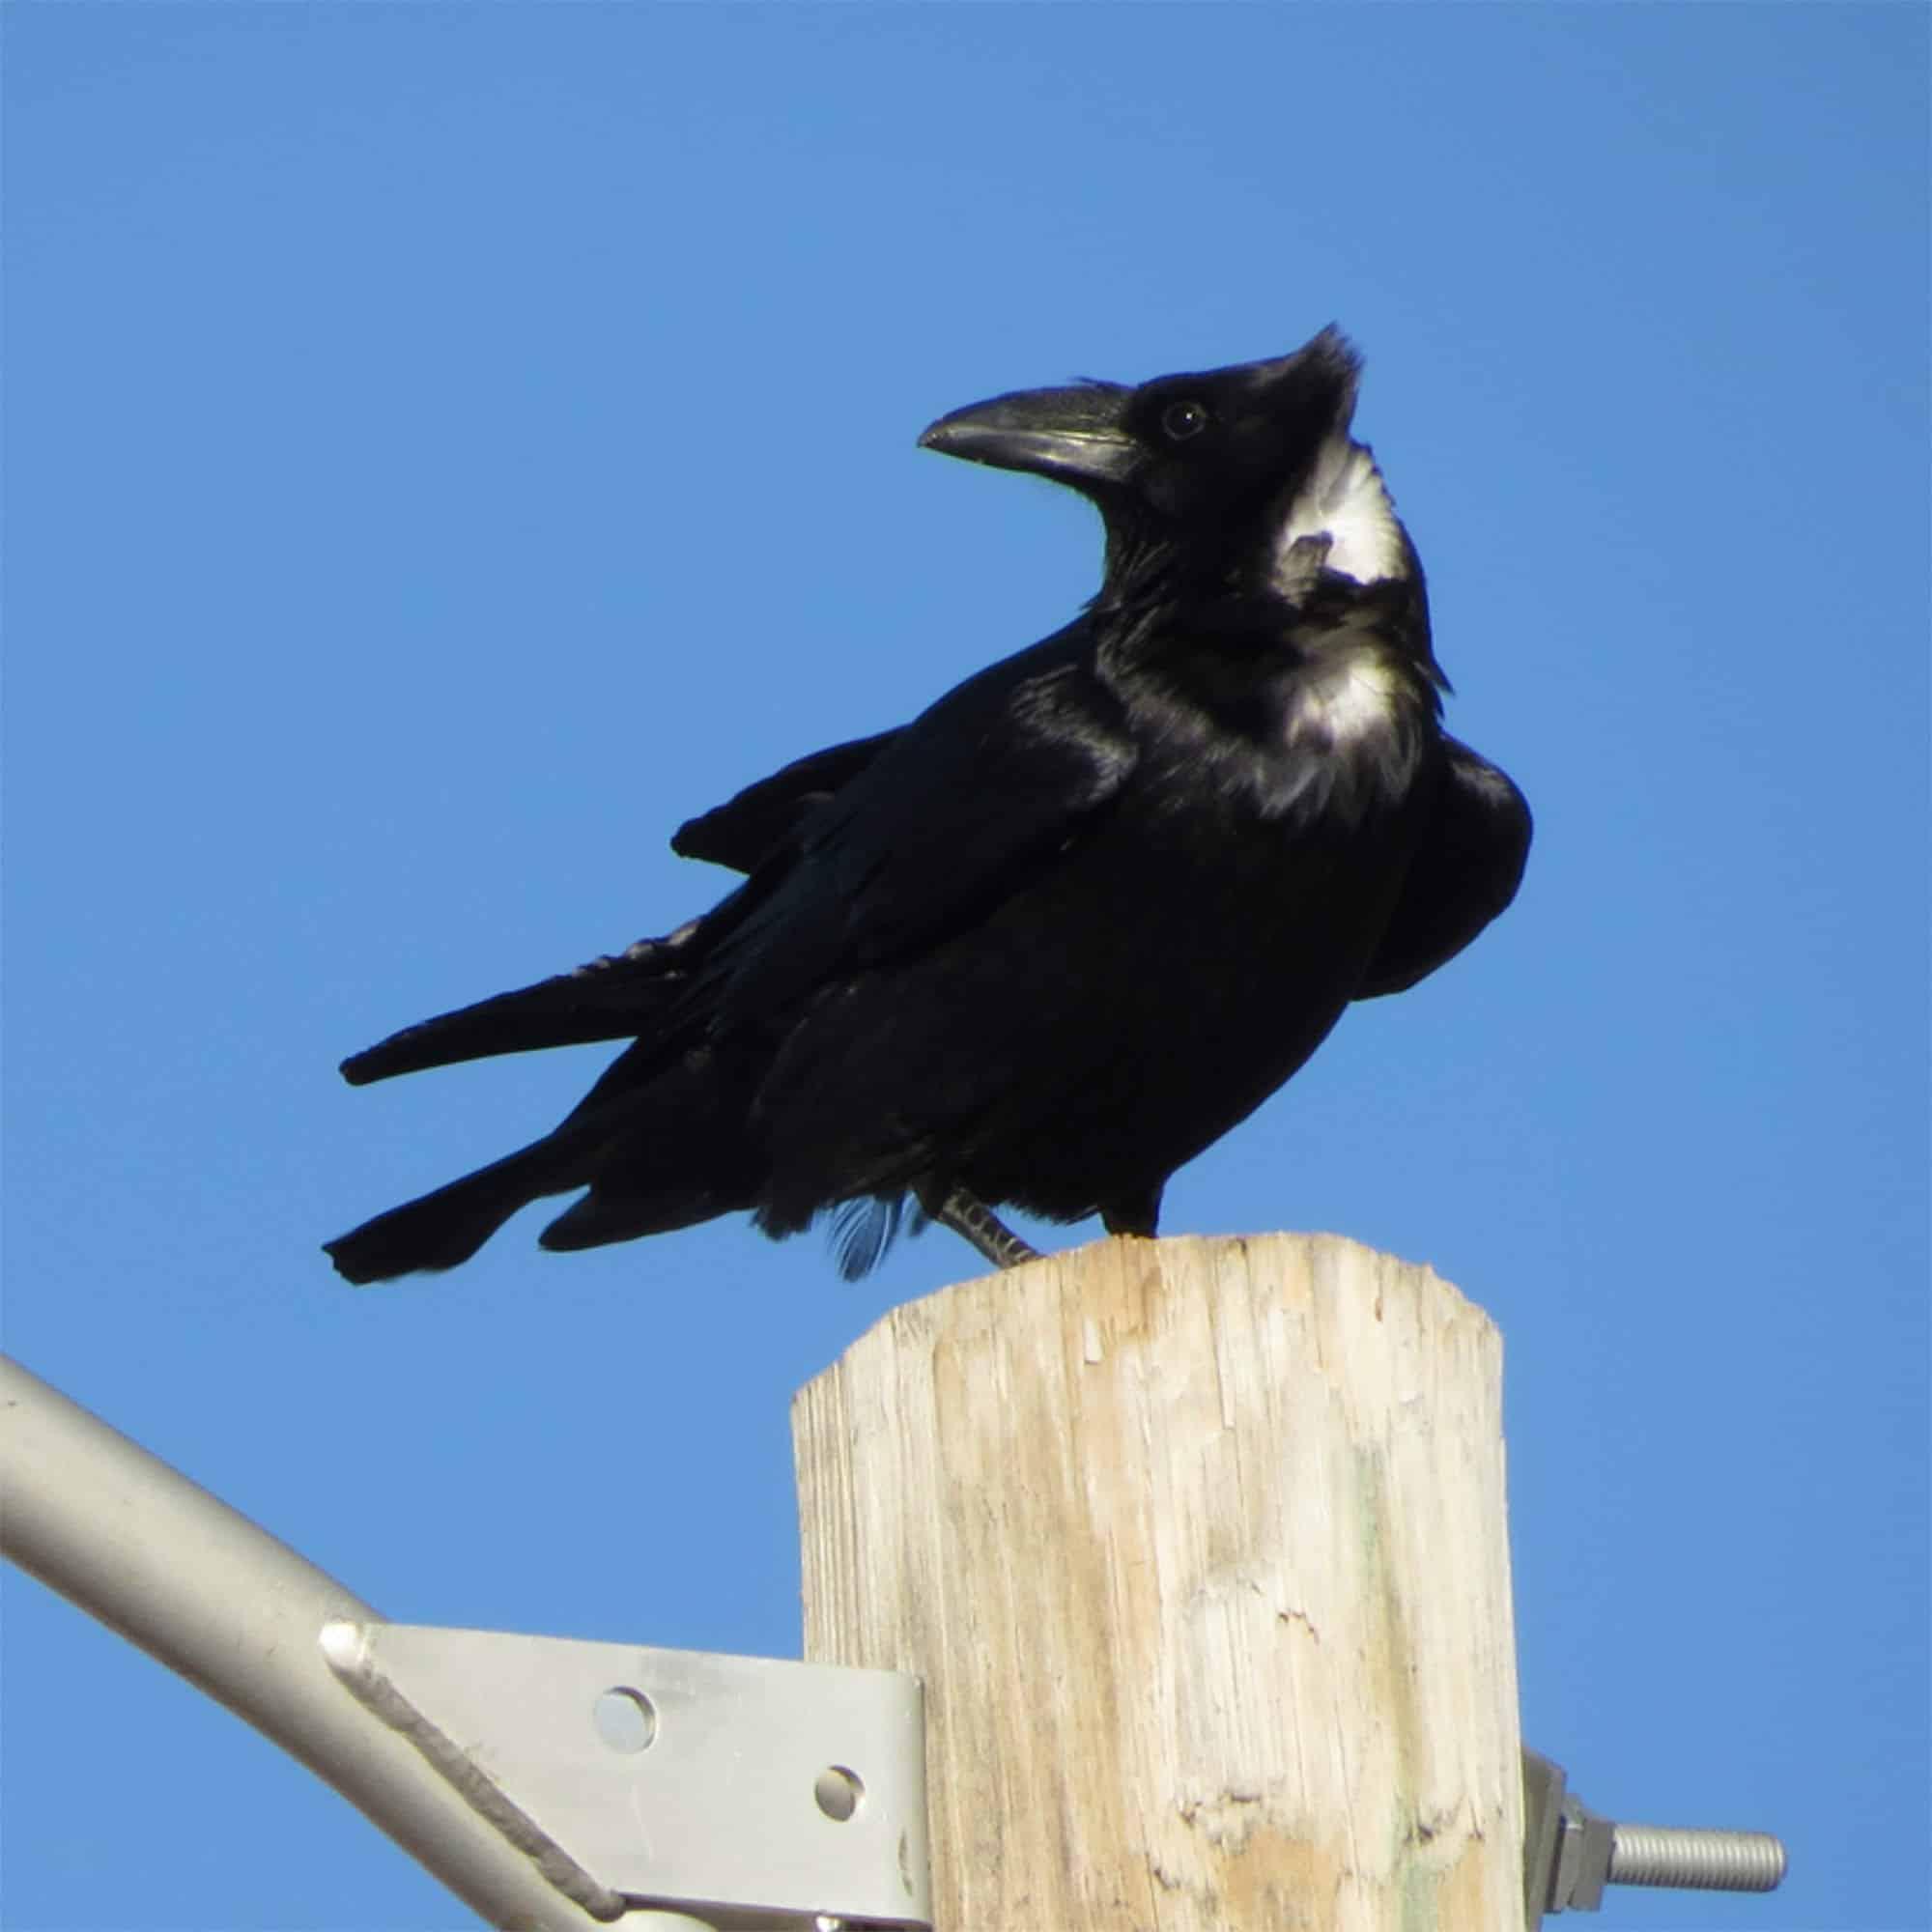 Chihuahua Raven in Sierra County NM